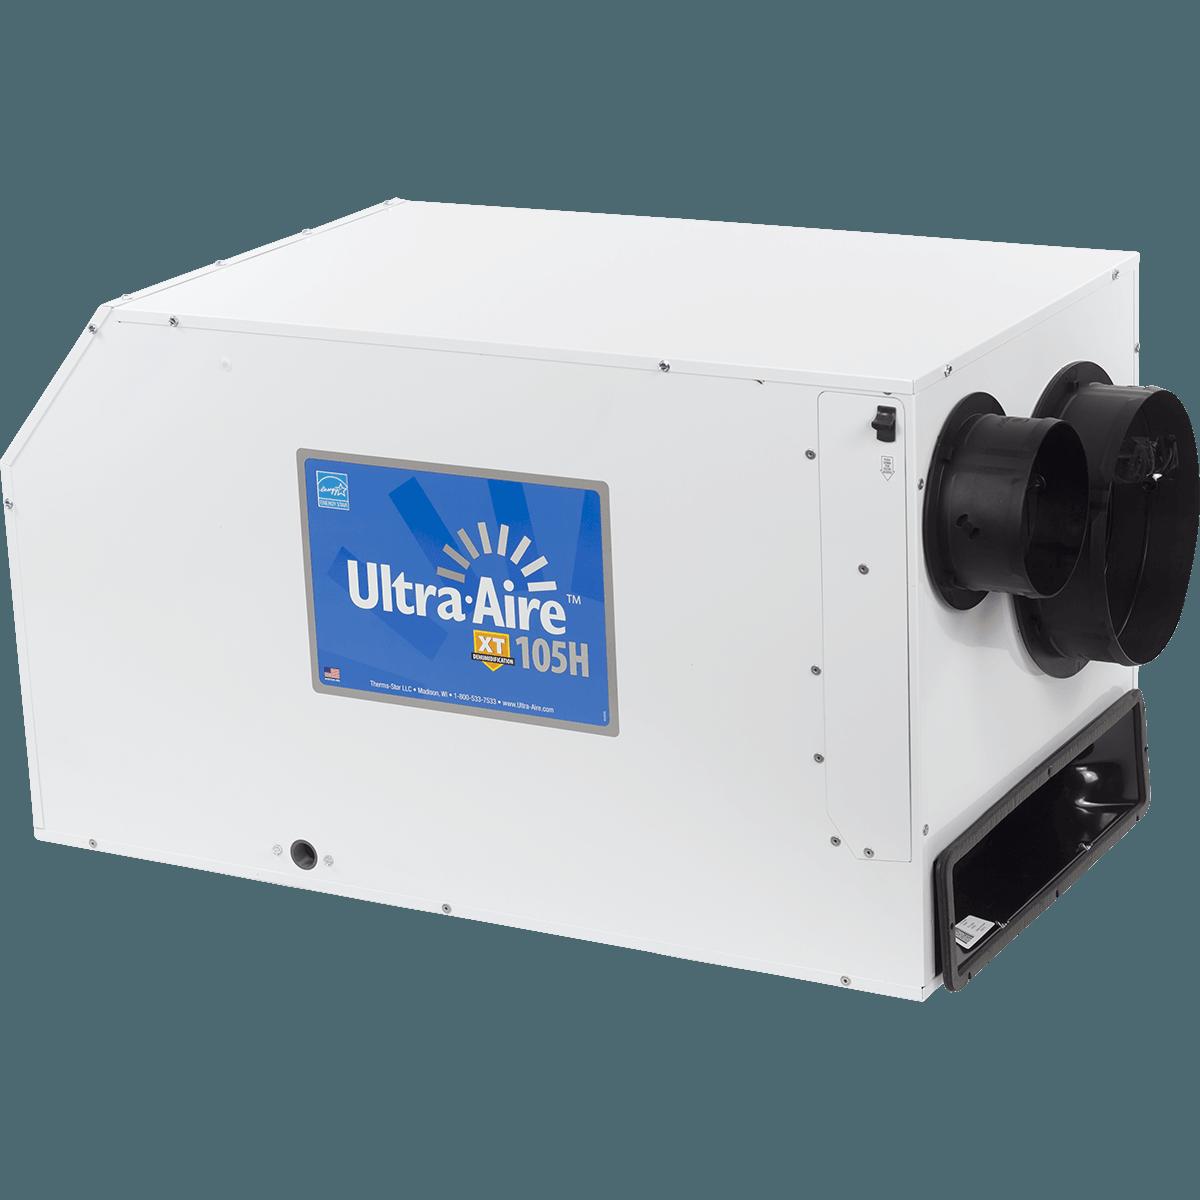 UltraAire 98 Pint Dehumidifier (98H) Dehumidifiers